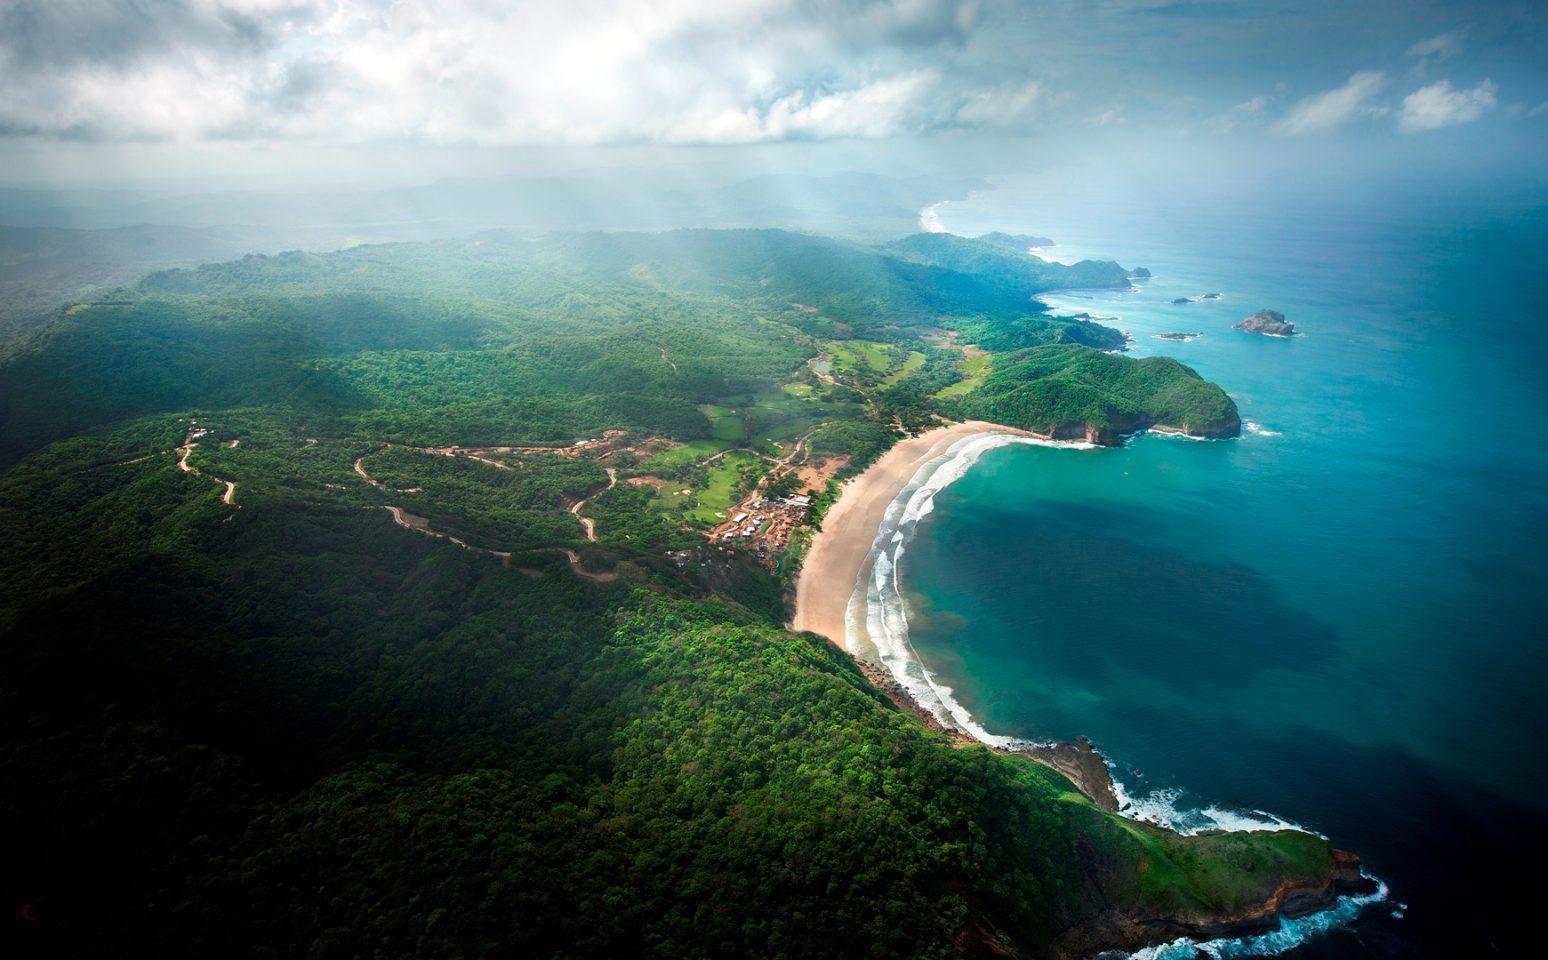 nicaragua 15 μέρη που αξίζει να επισκεφτείς μέσα στο 2017